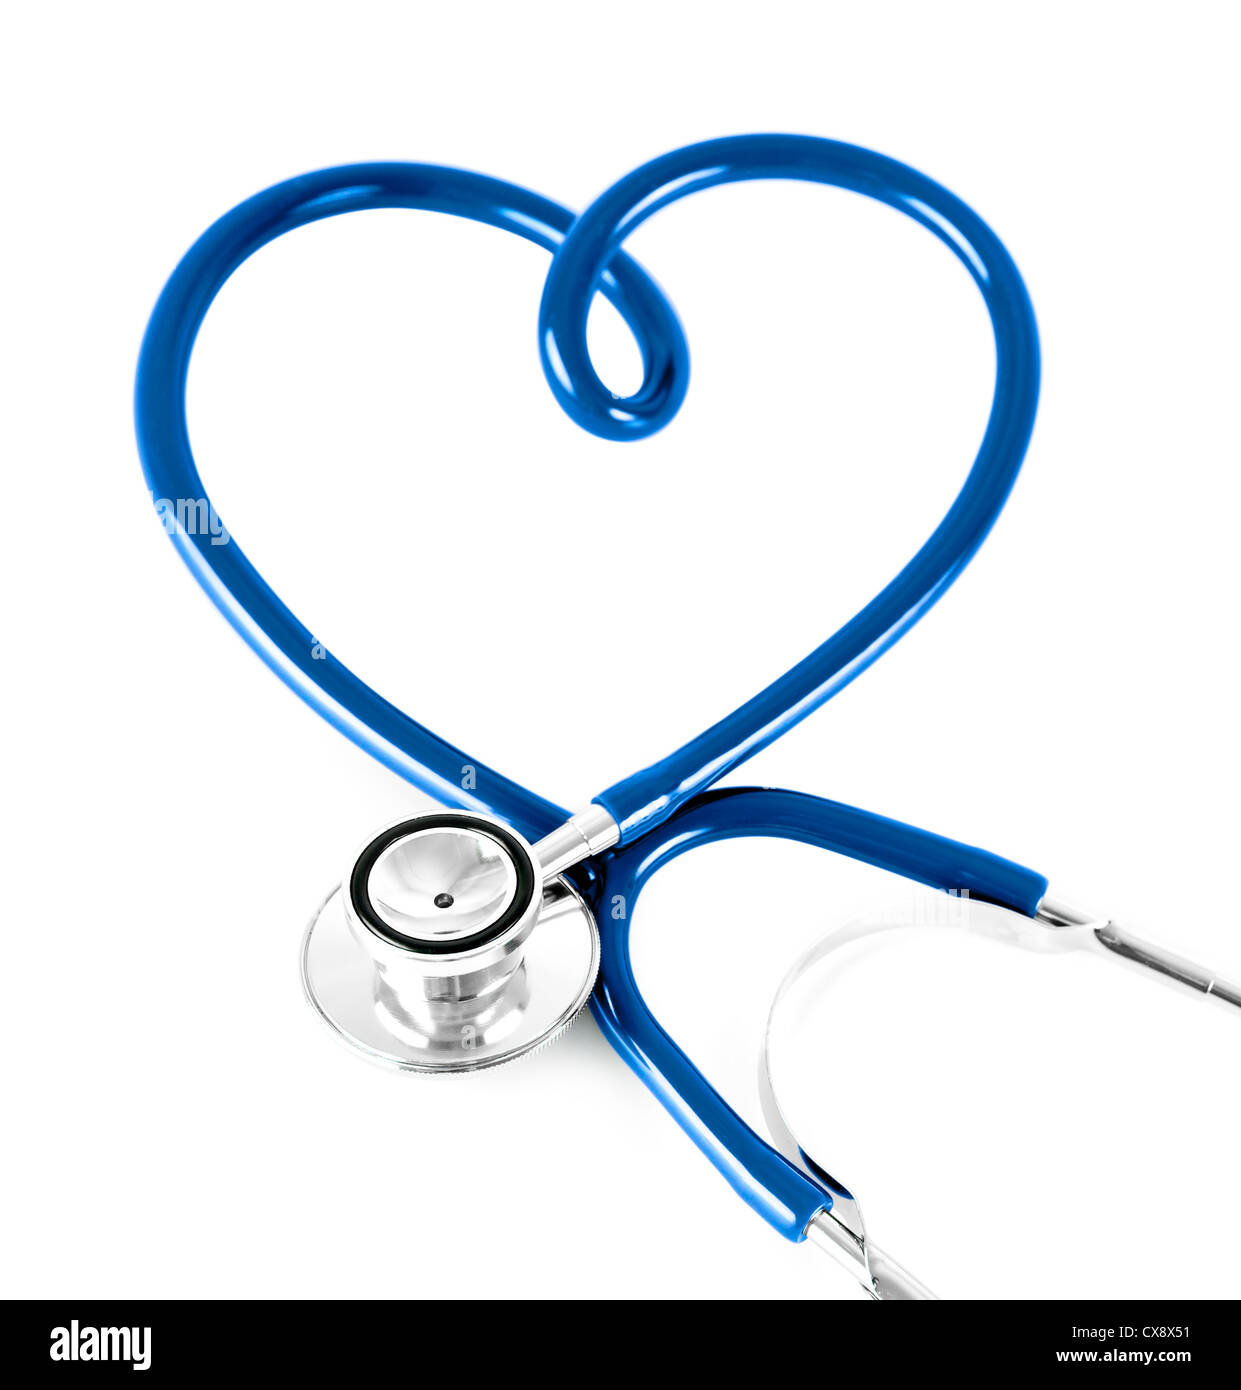 Estetoscopio en forma de corazón concepto. color azul. Imagen De Stock